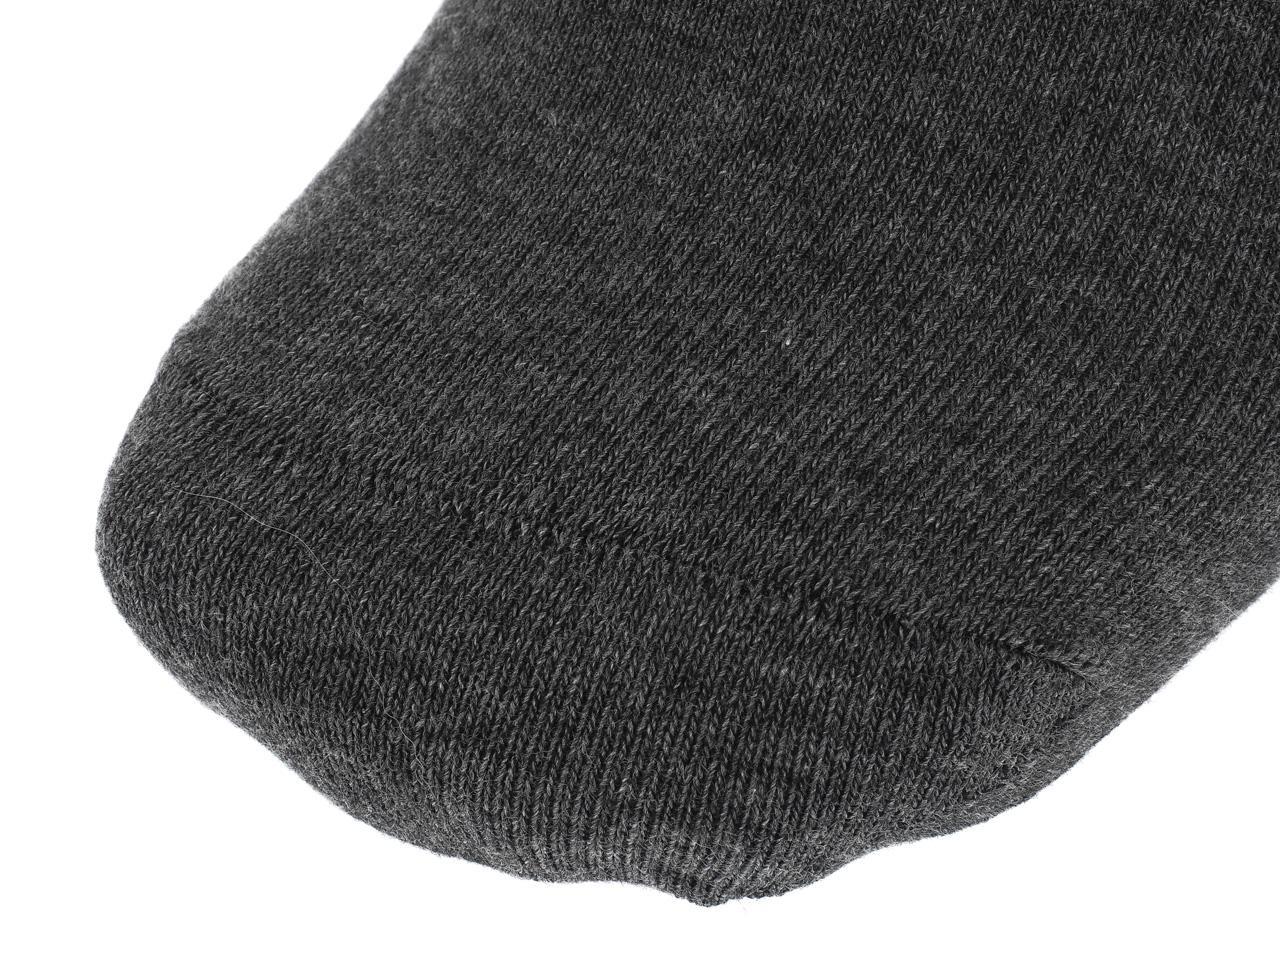 Socks-Puma-Classic-Anth-2-Pairs-Grey-14724-New thumbnail 4